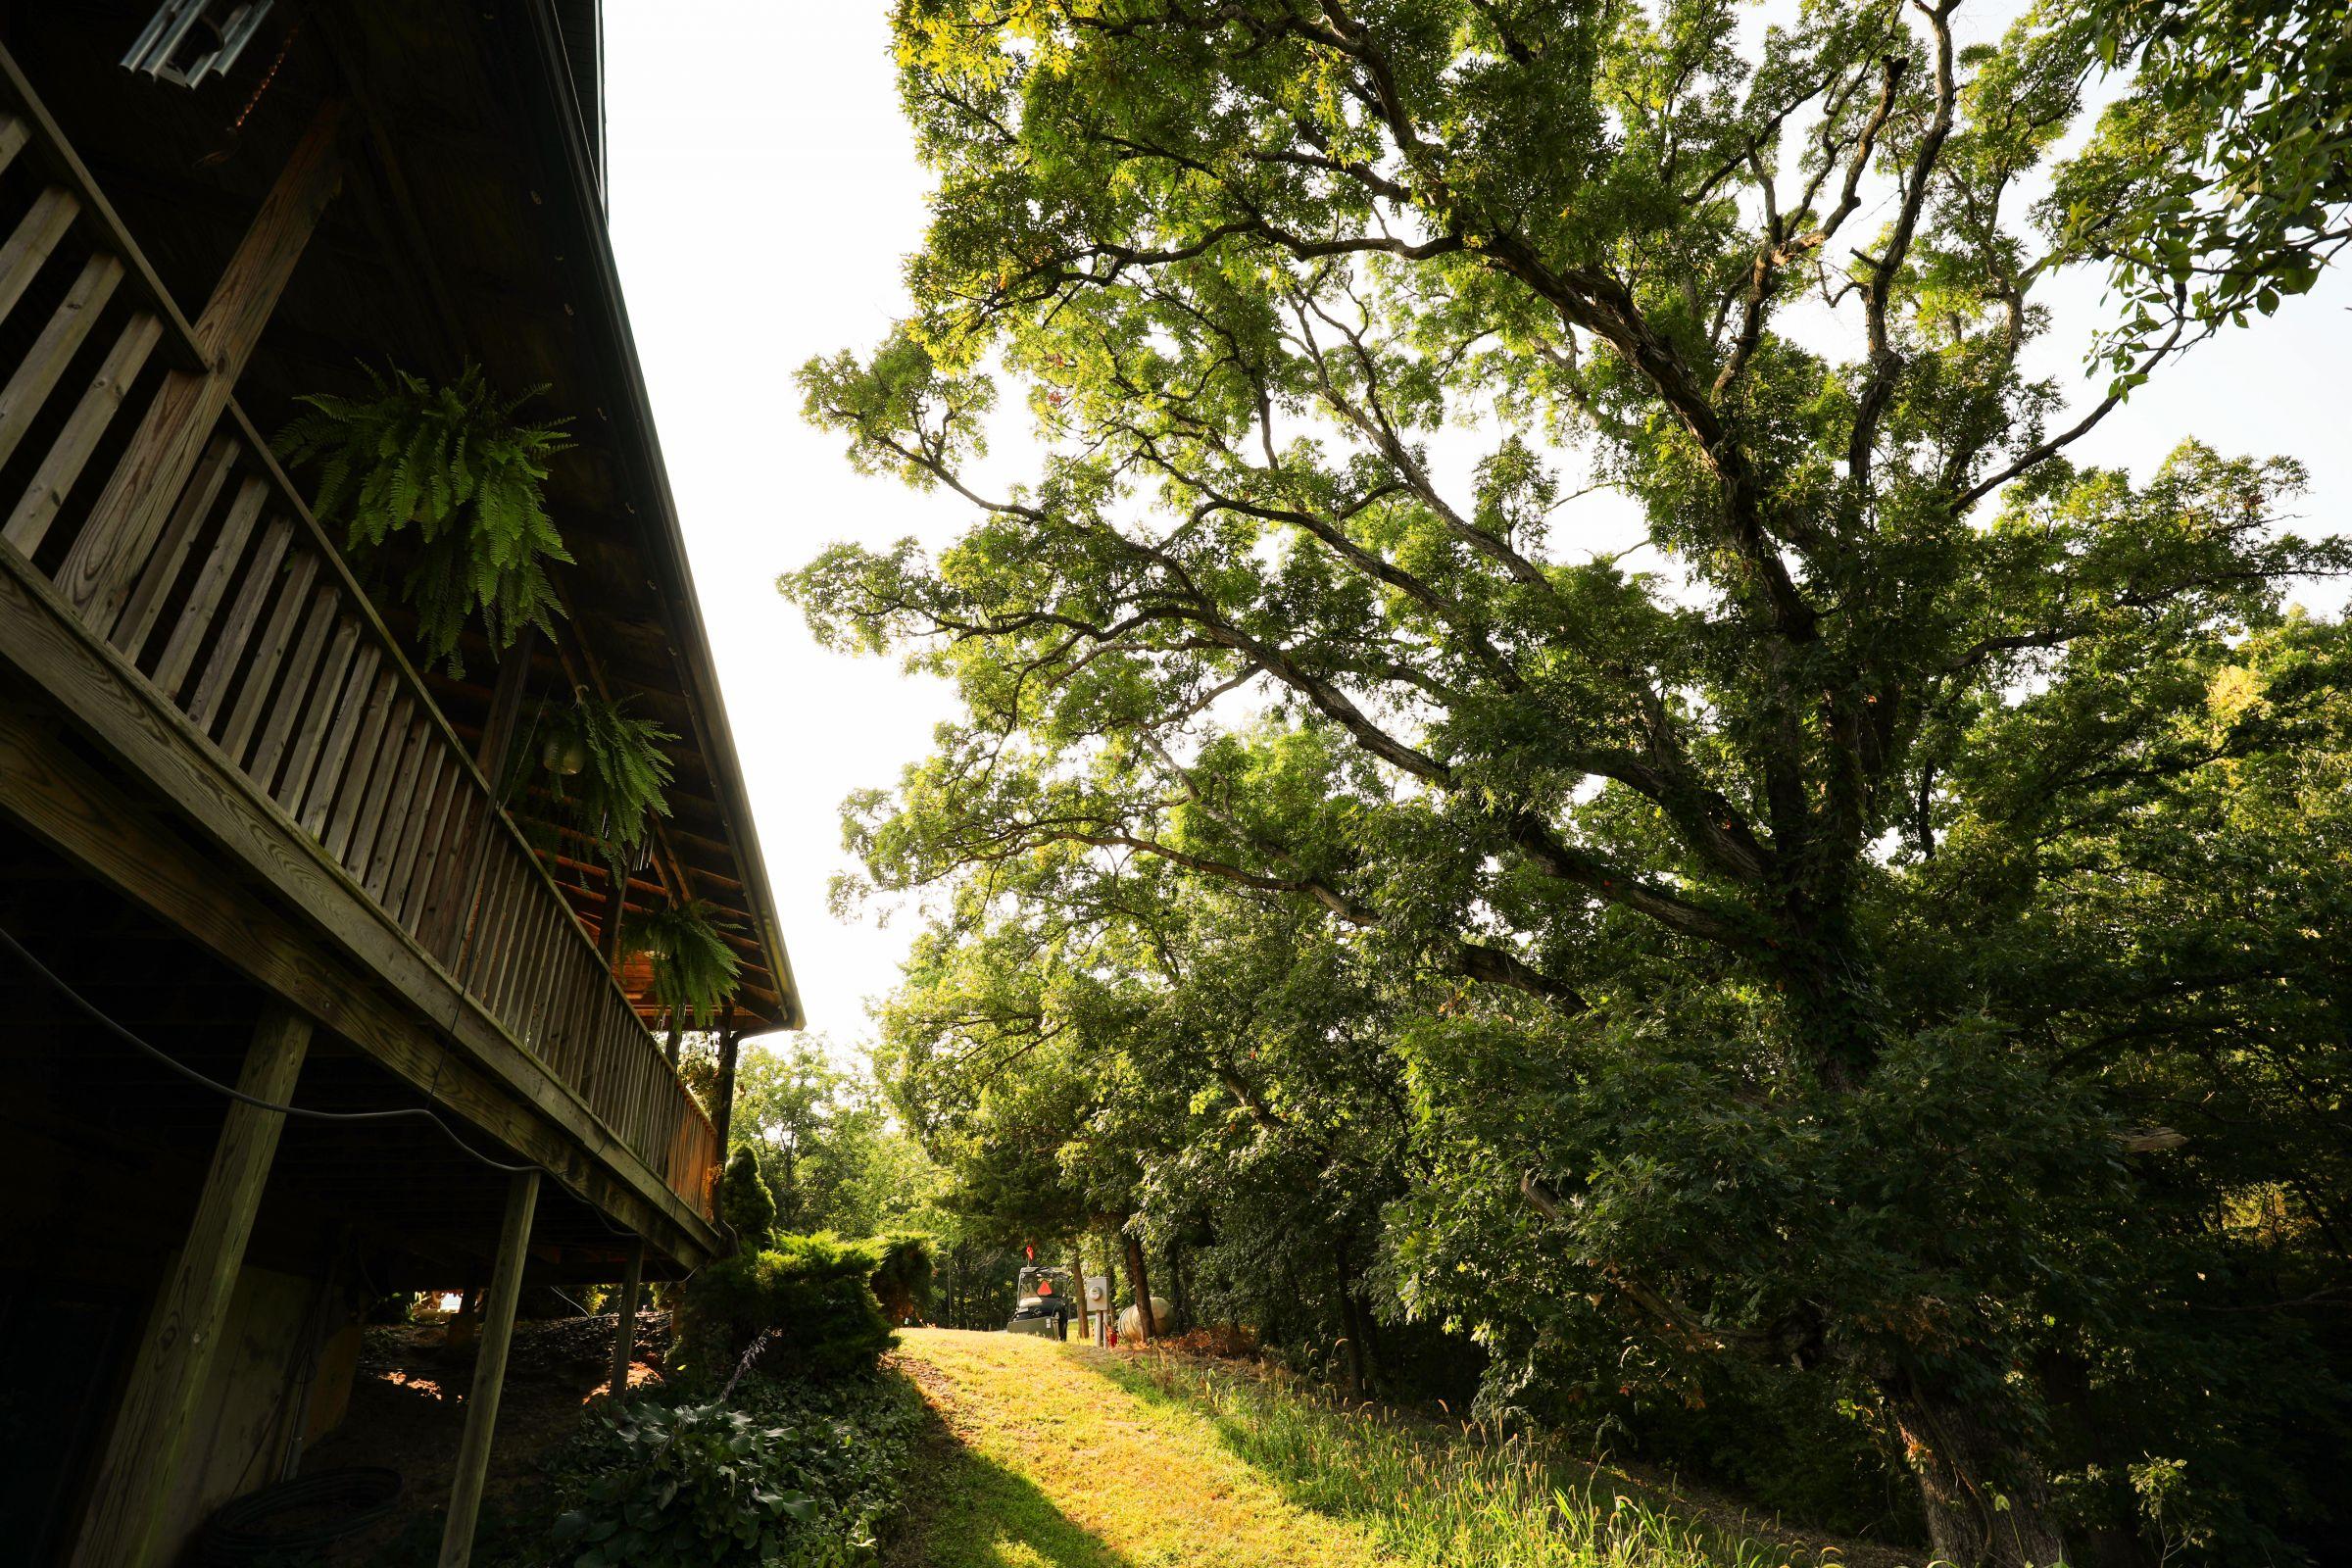 land-lee-county-iowa-328-acres-listing-number-15137-8-2020-08-27-174705.jpg